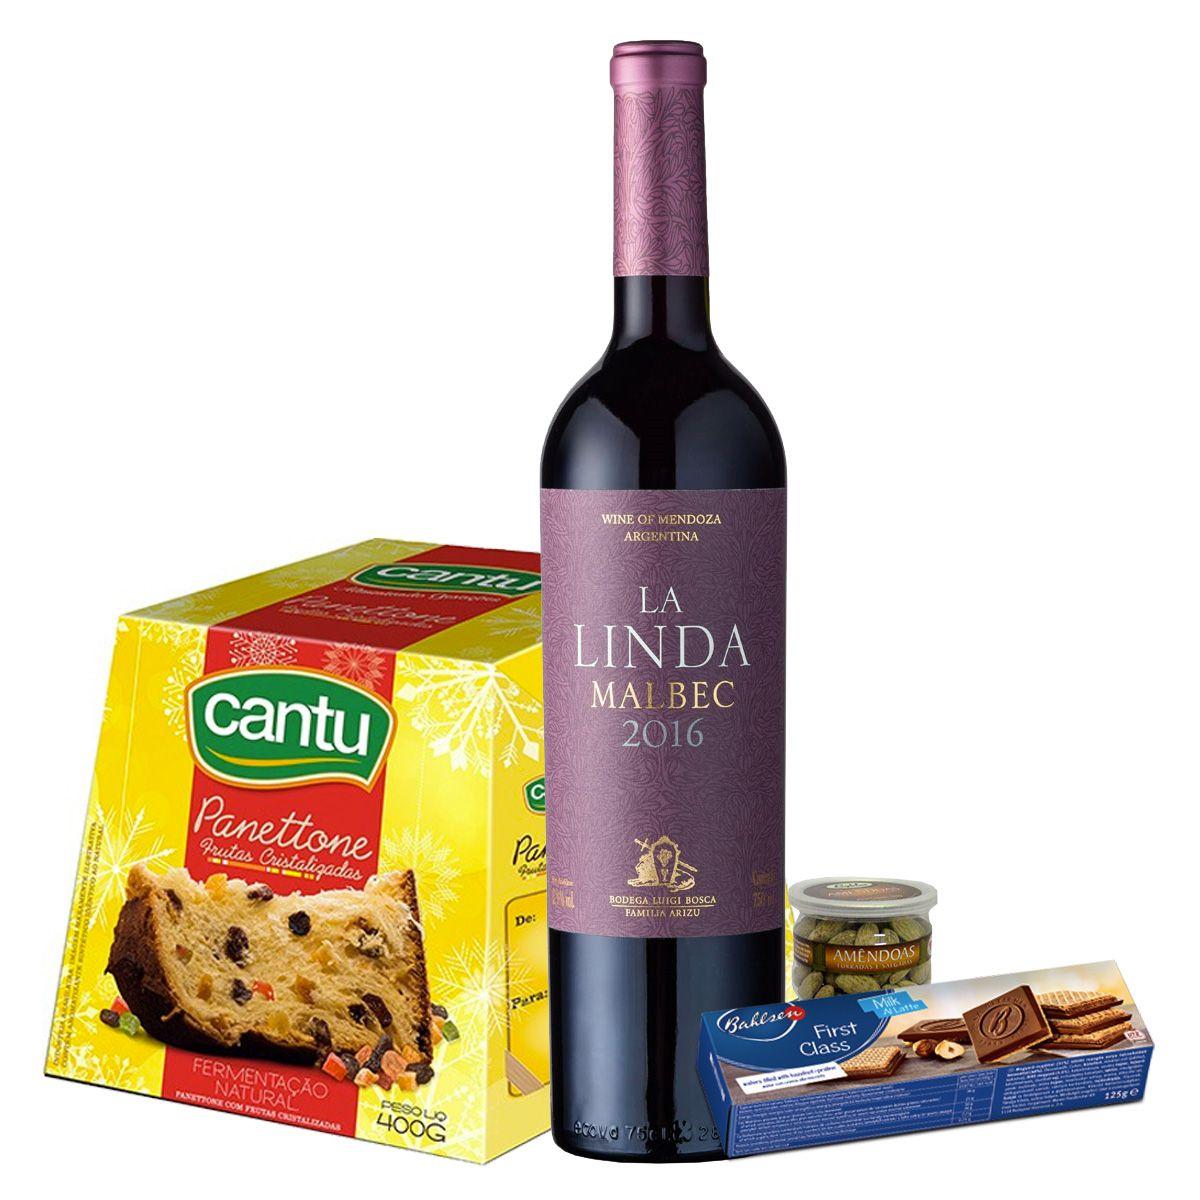 Kit de Natal - La LindaMalbec, Panettone de frutas Cantu, Amêndoas e Biscoito Bahlsen